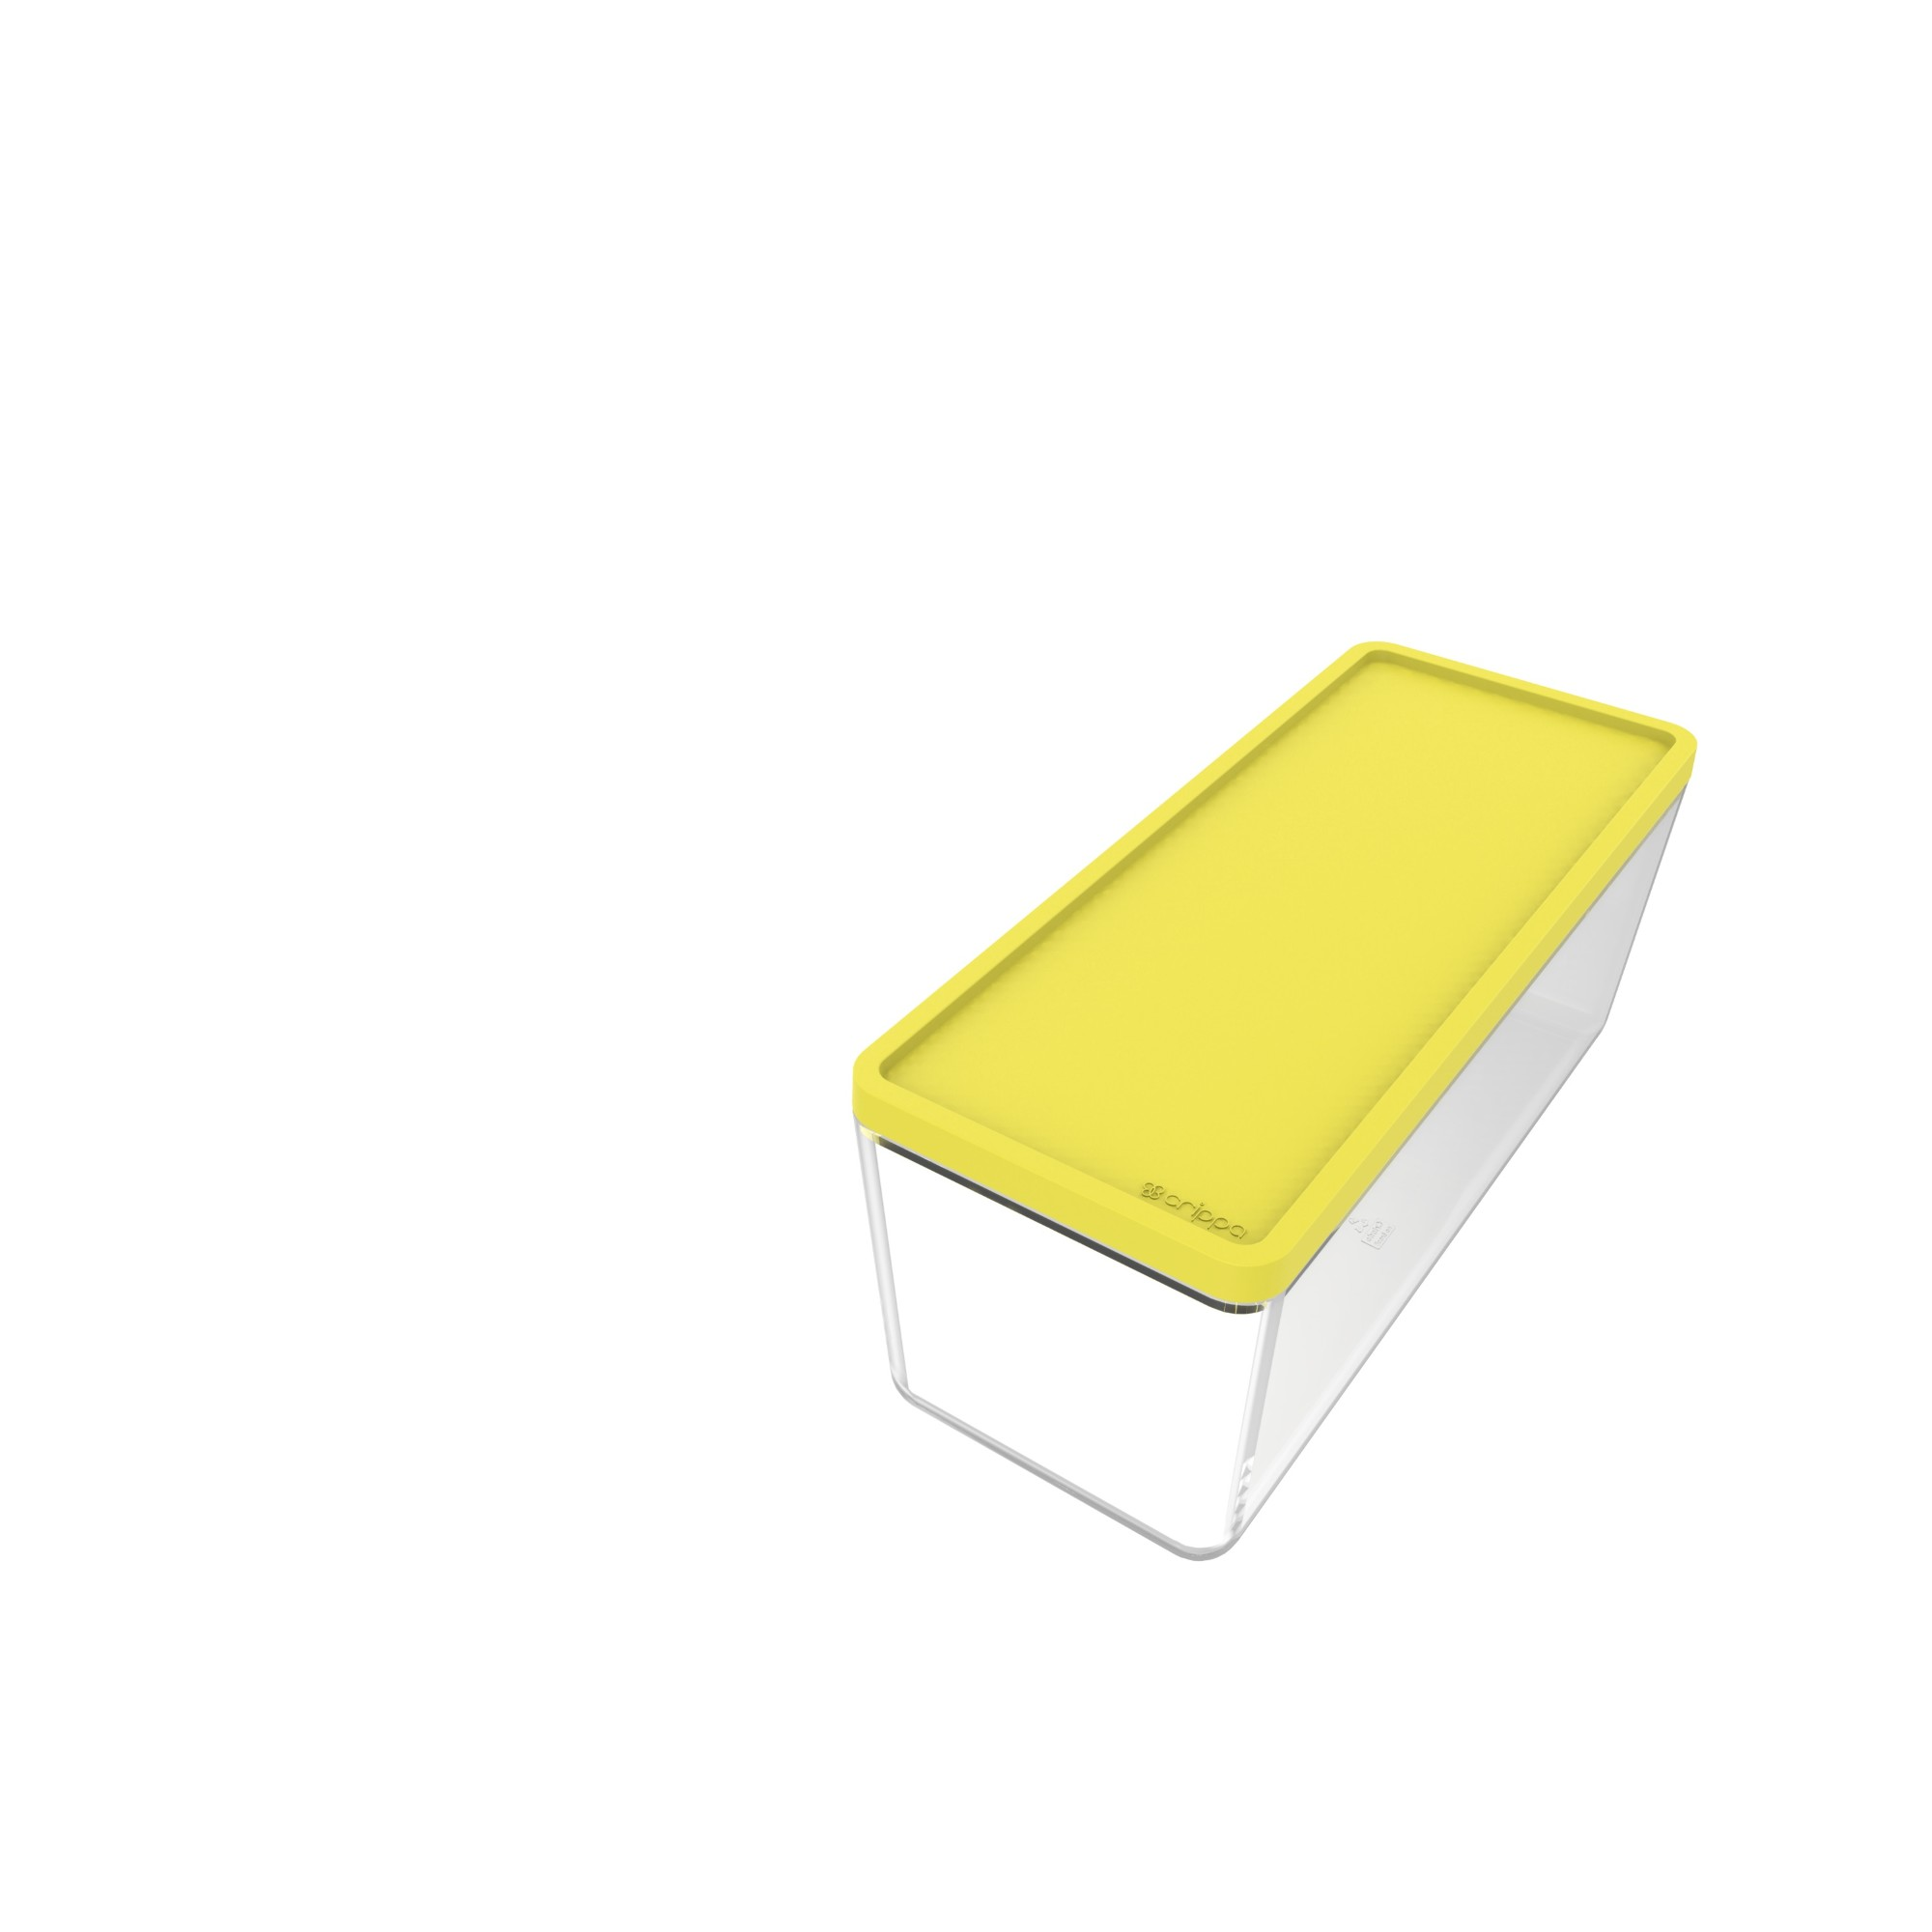 Pote Plastico Hermetico Retangular 750ml Amarelo - Crippa